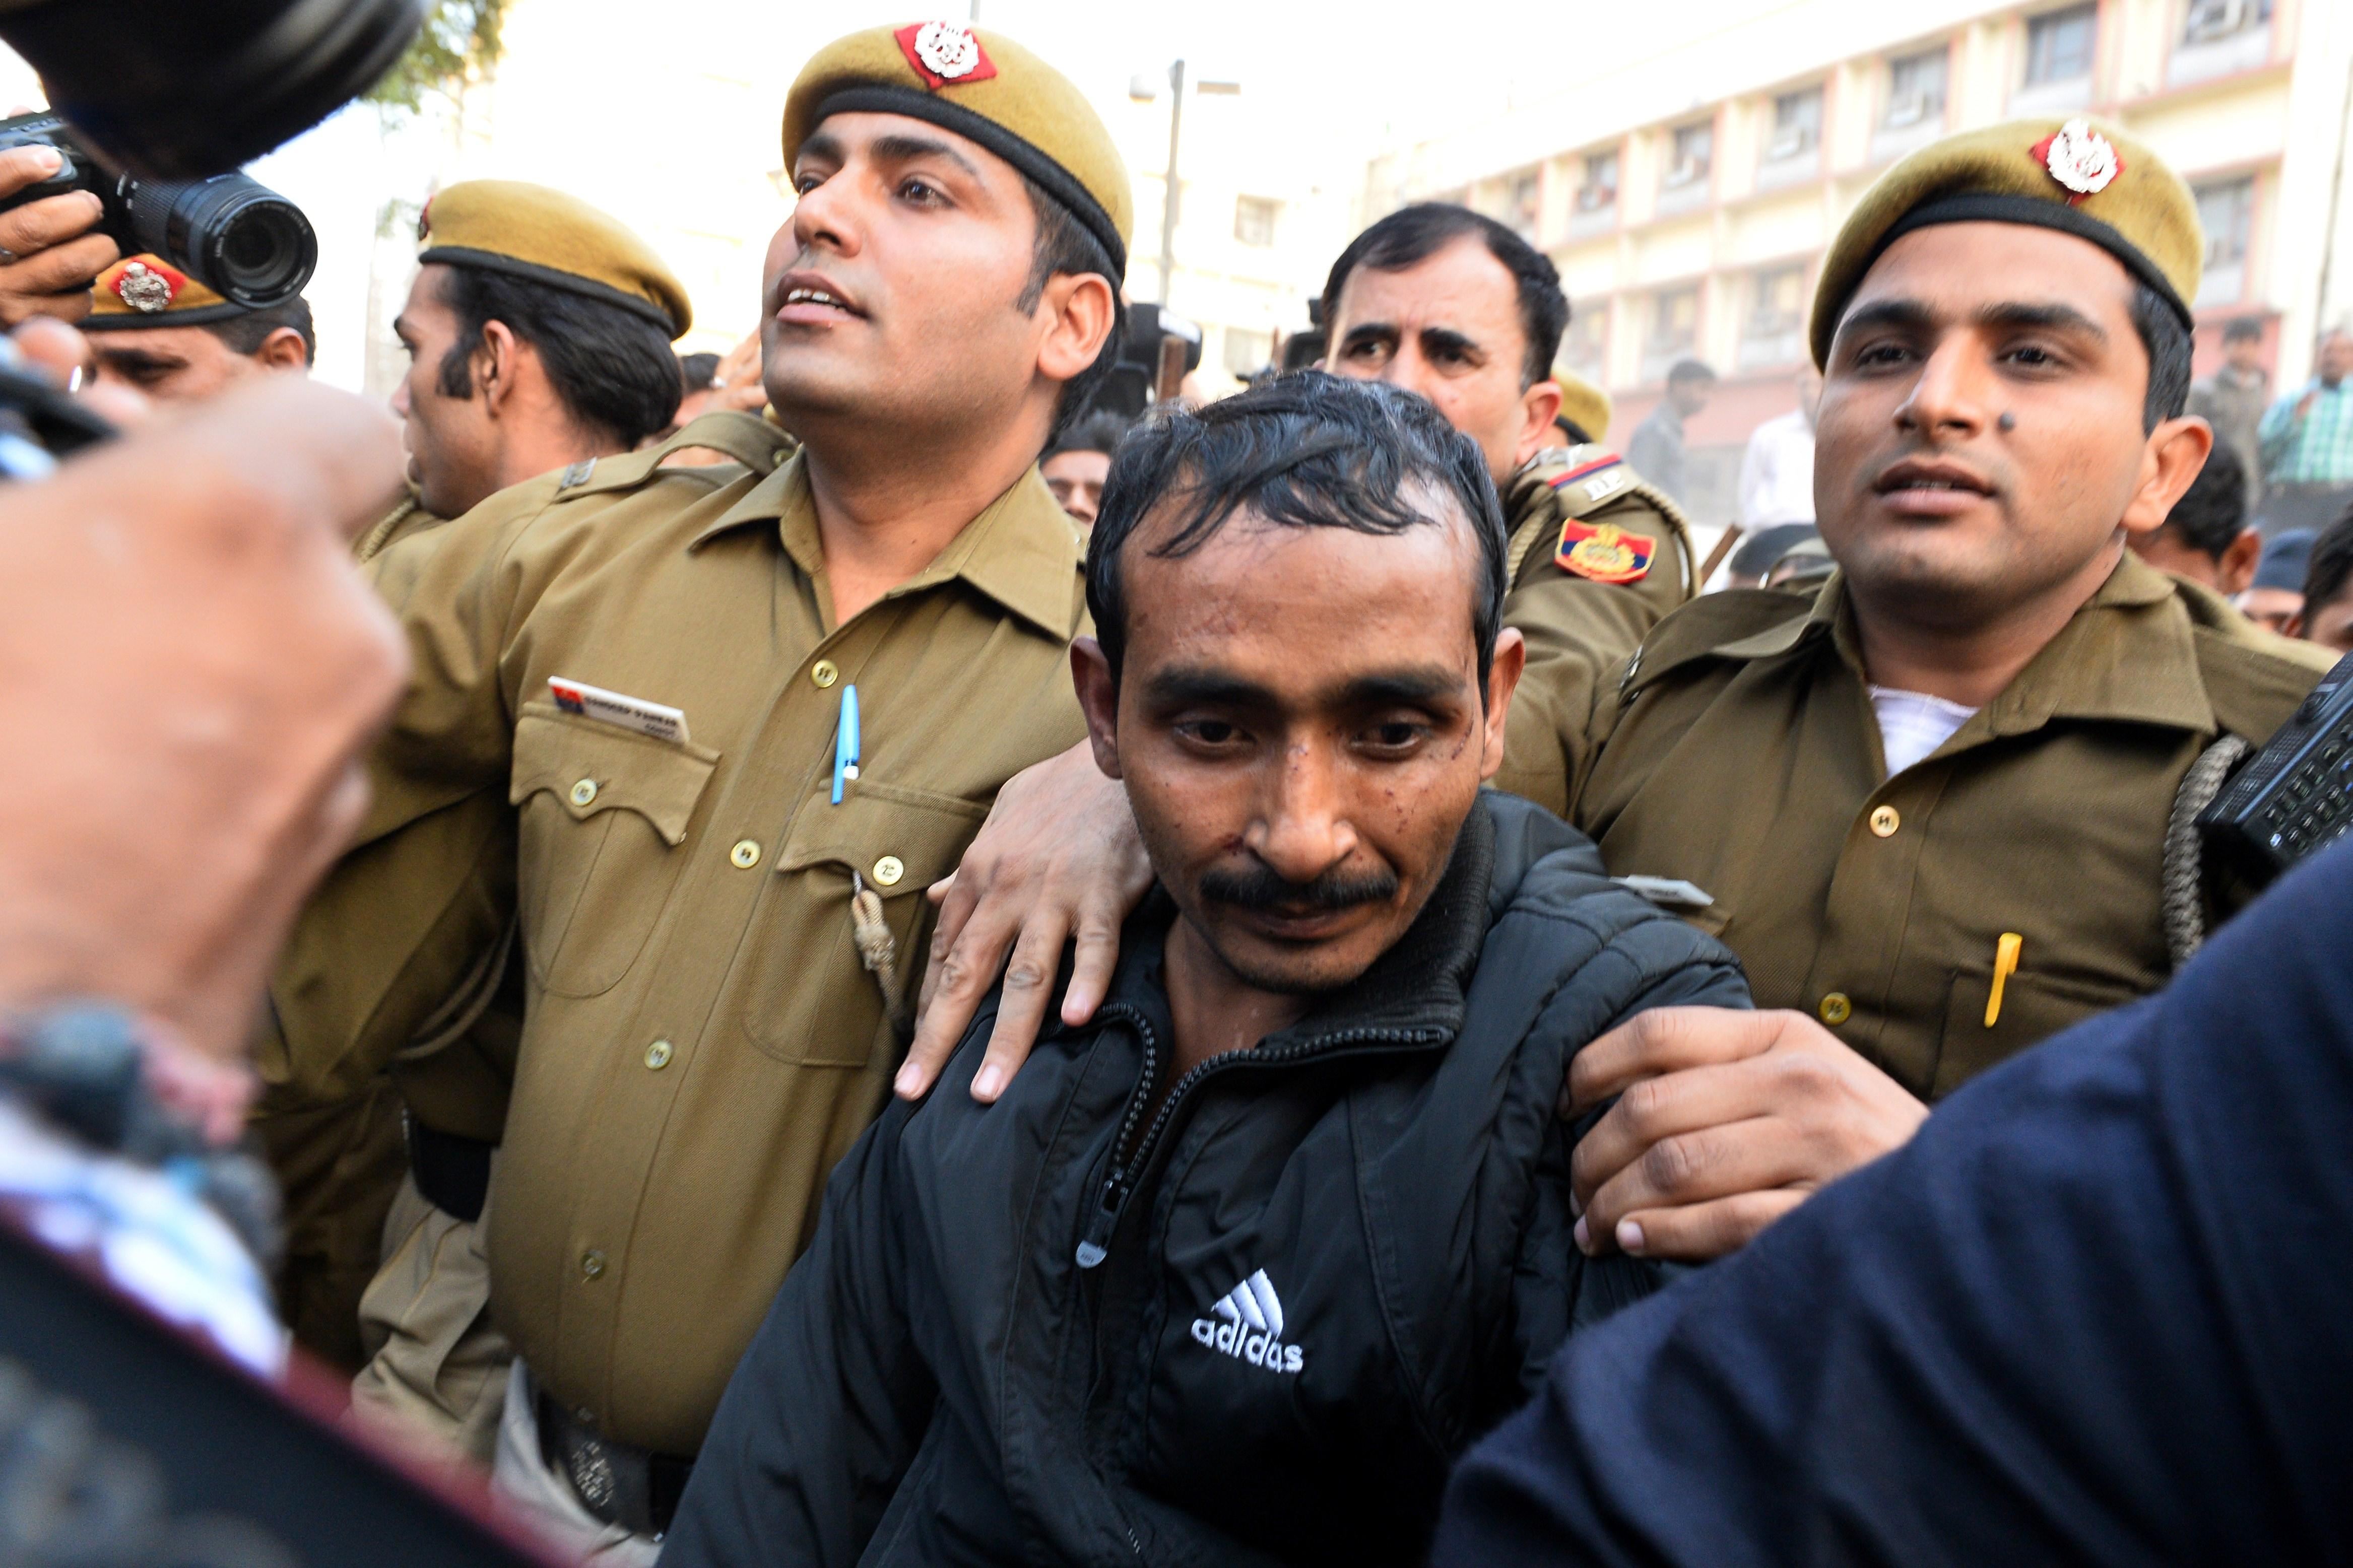 INDIA-CRIME-RAPE-TRANSPORT-UBER